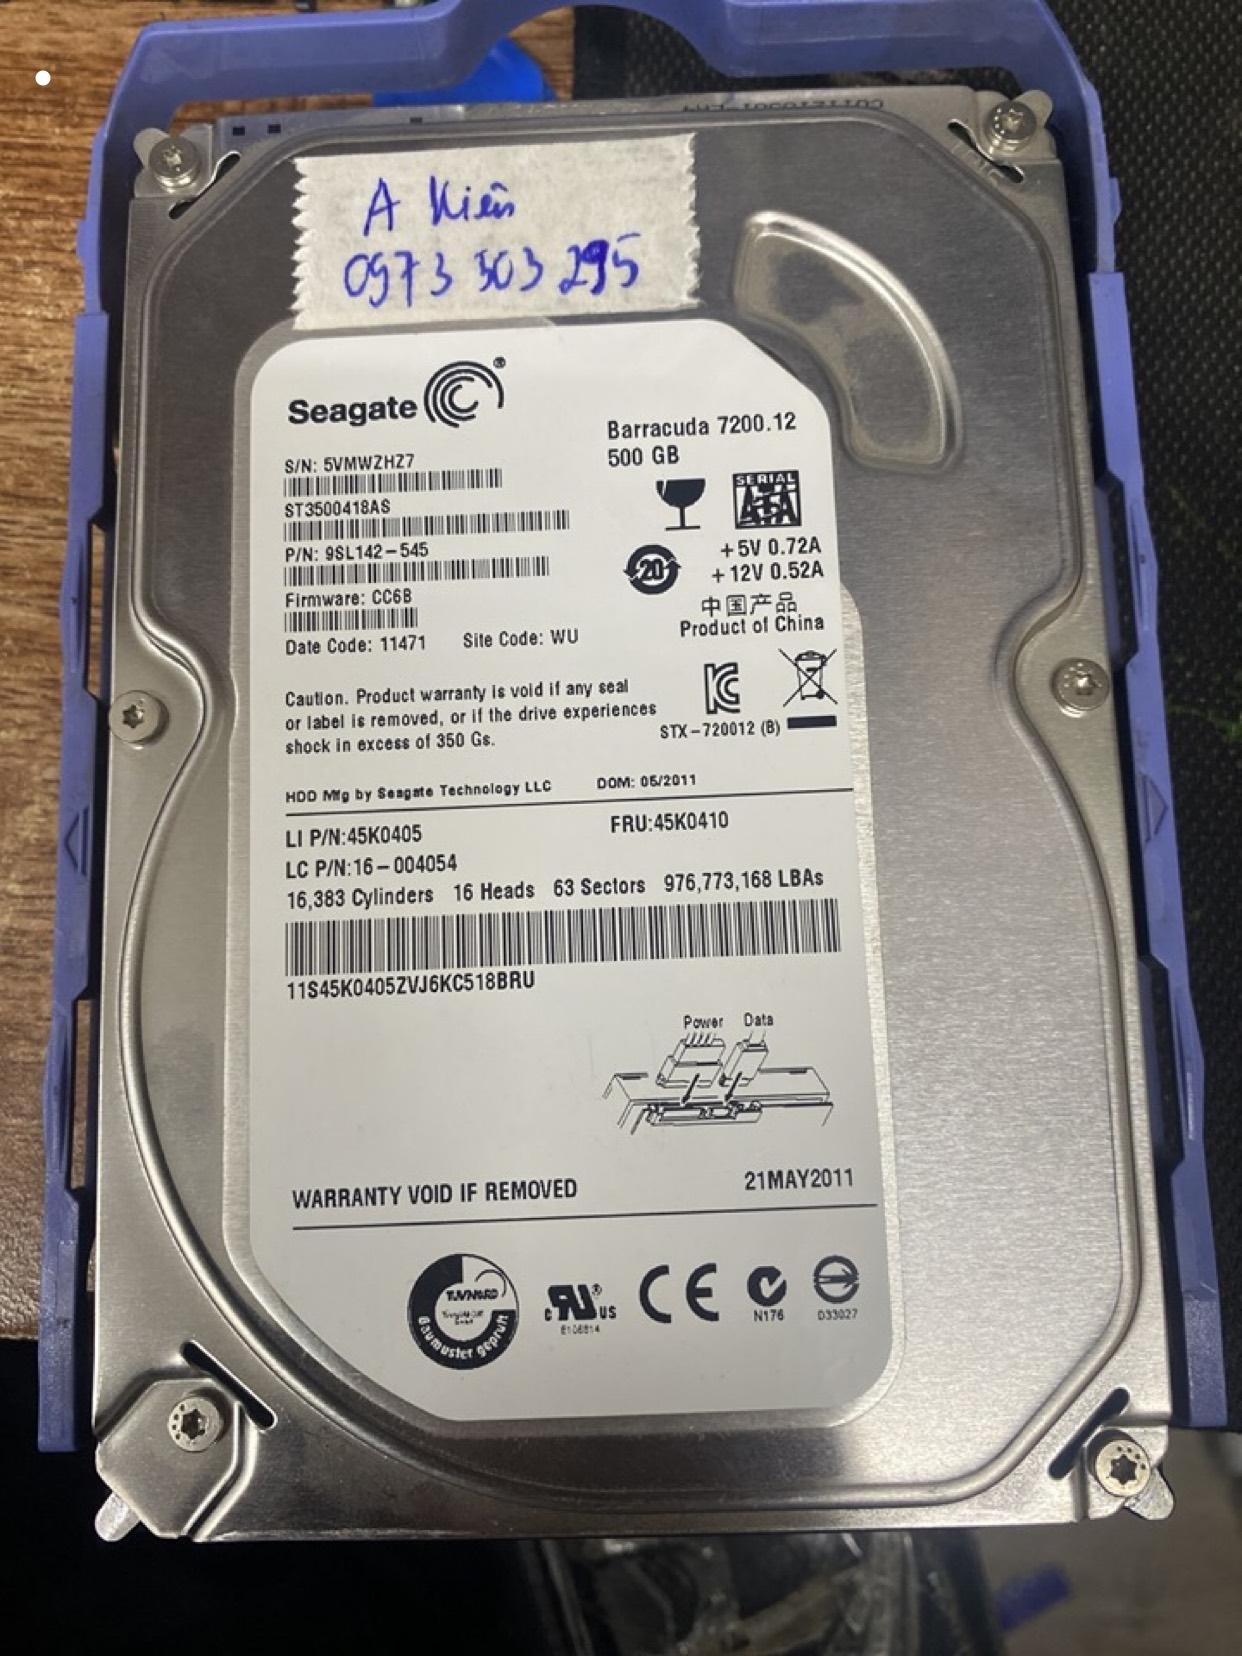 Cứu dữ liệu ổ cứng Seagate 500GB mất dữ liệu 29/02/2020 - cuumaytinh